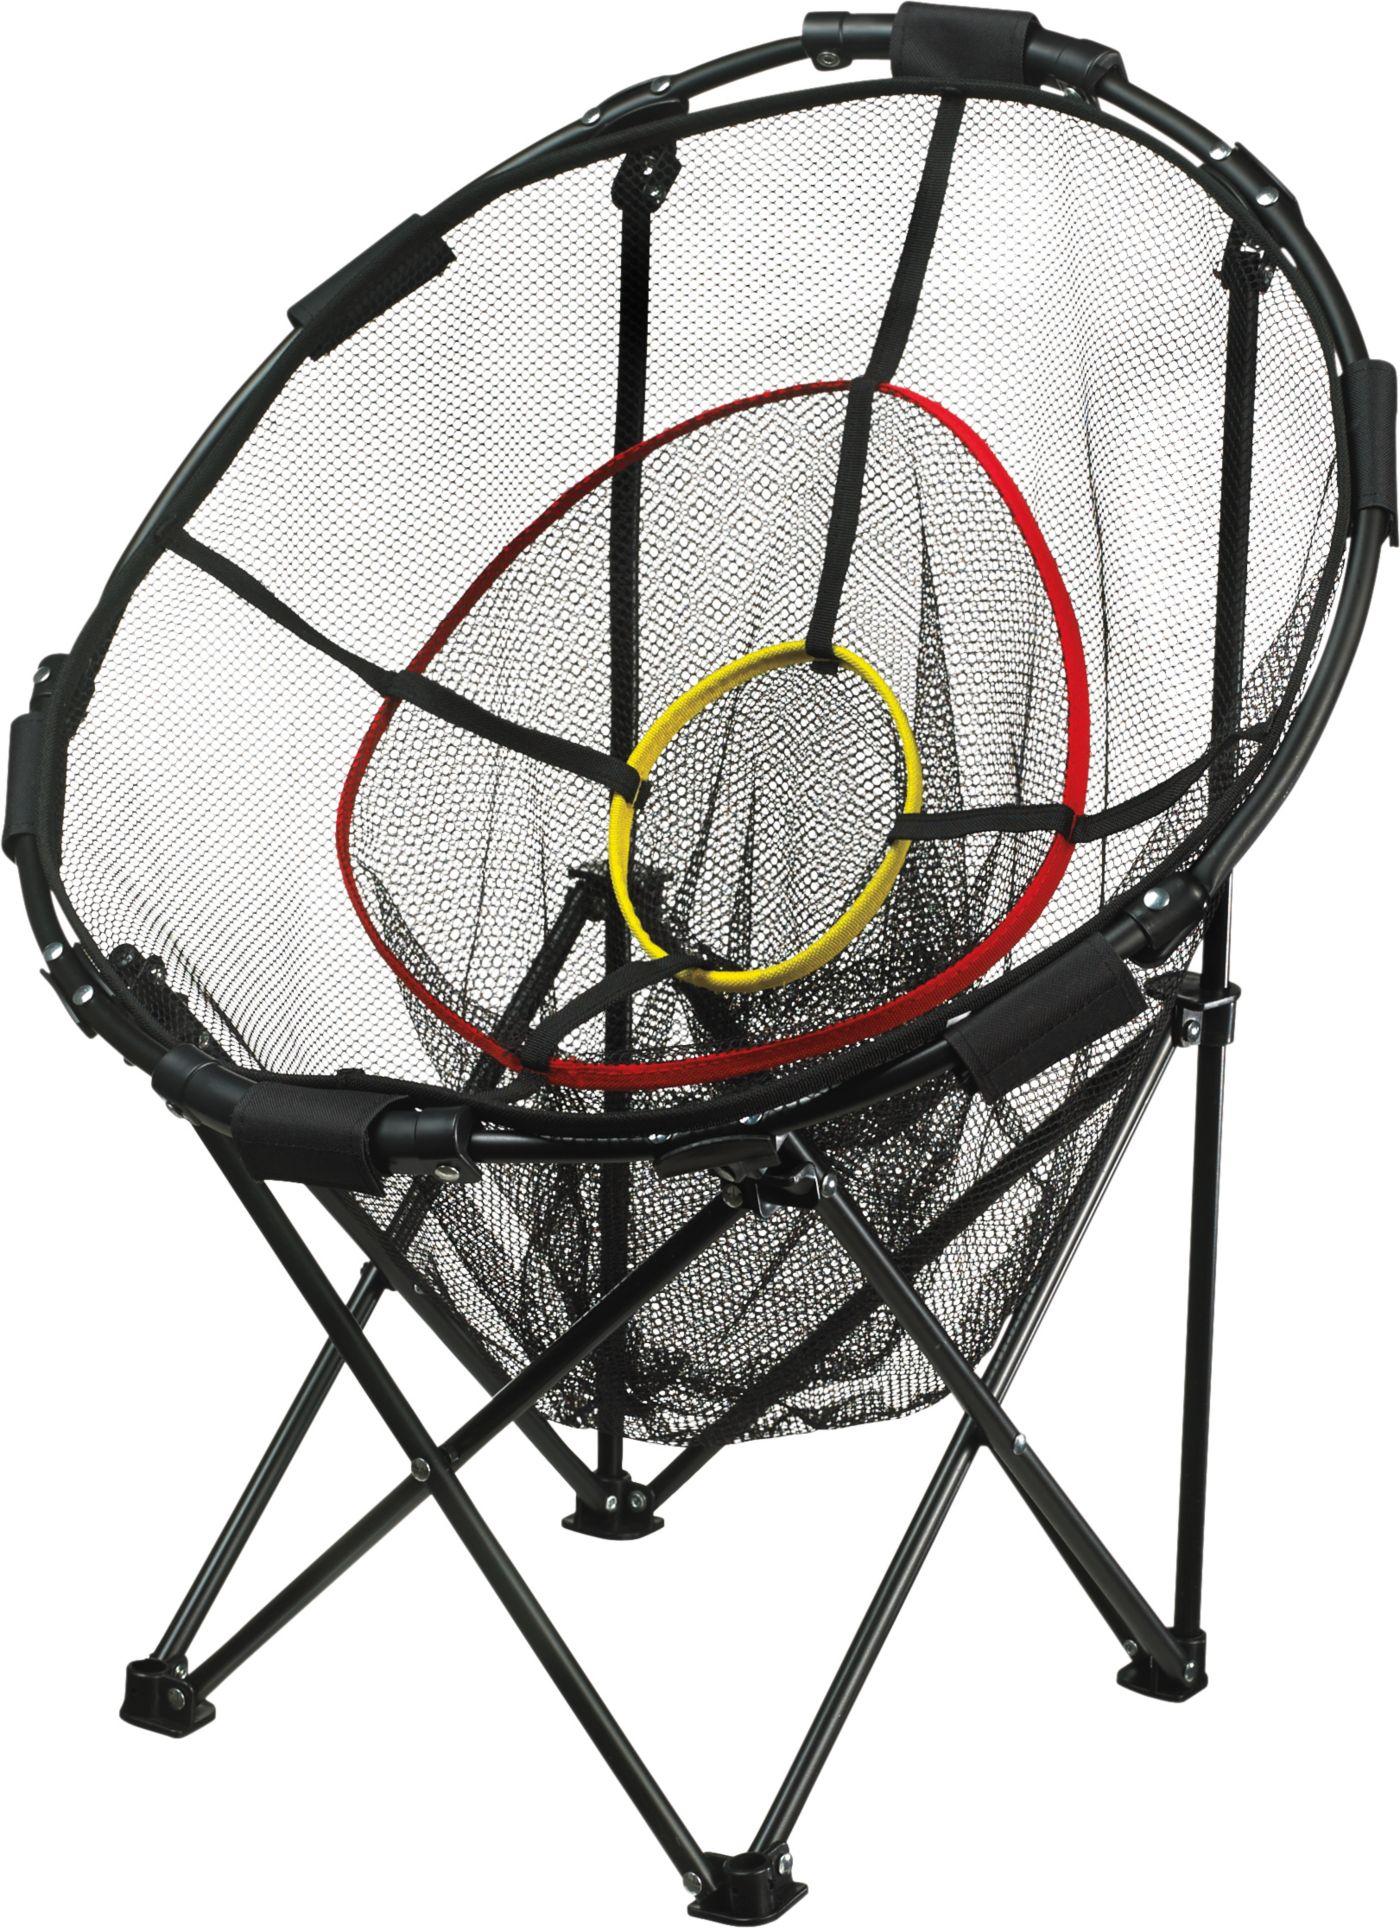 "Maxfli 39"" Chipping Basket"